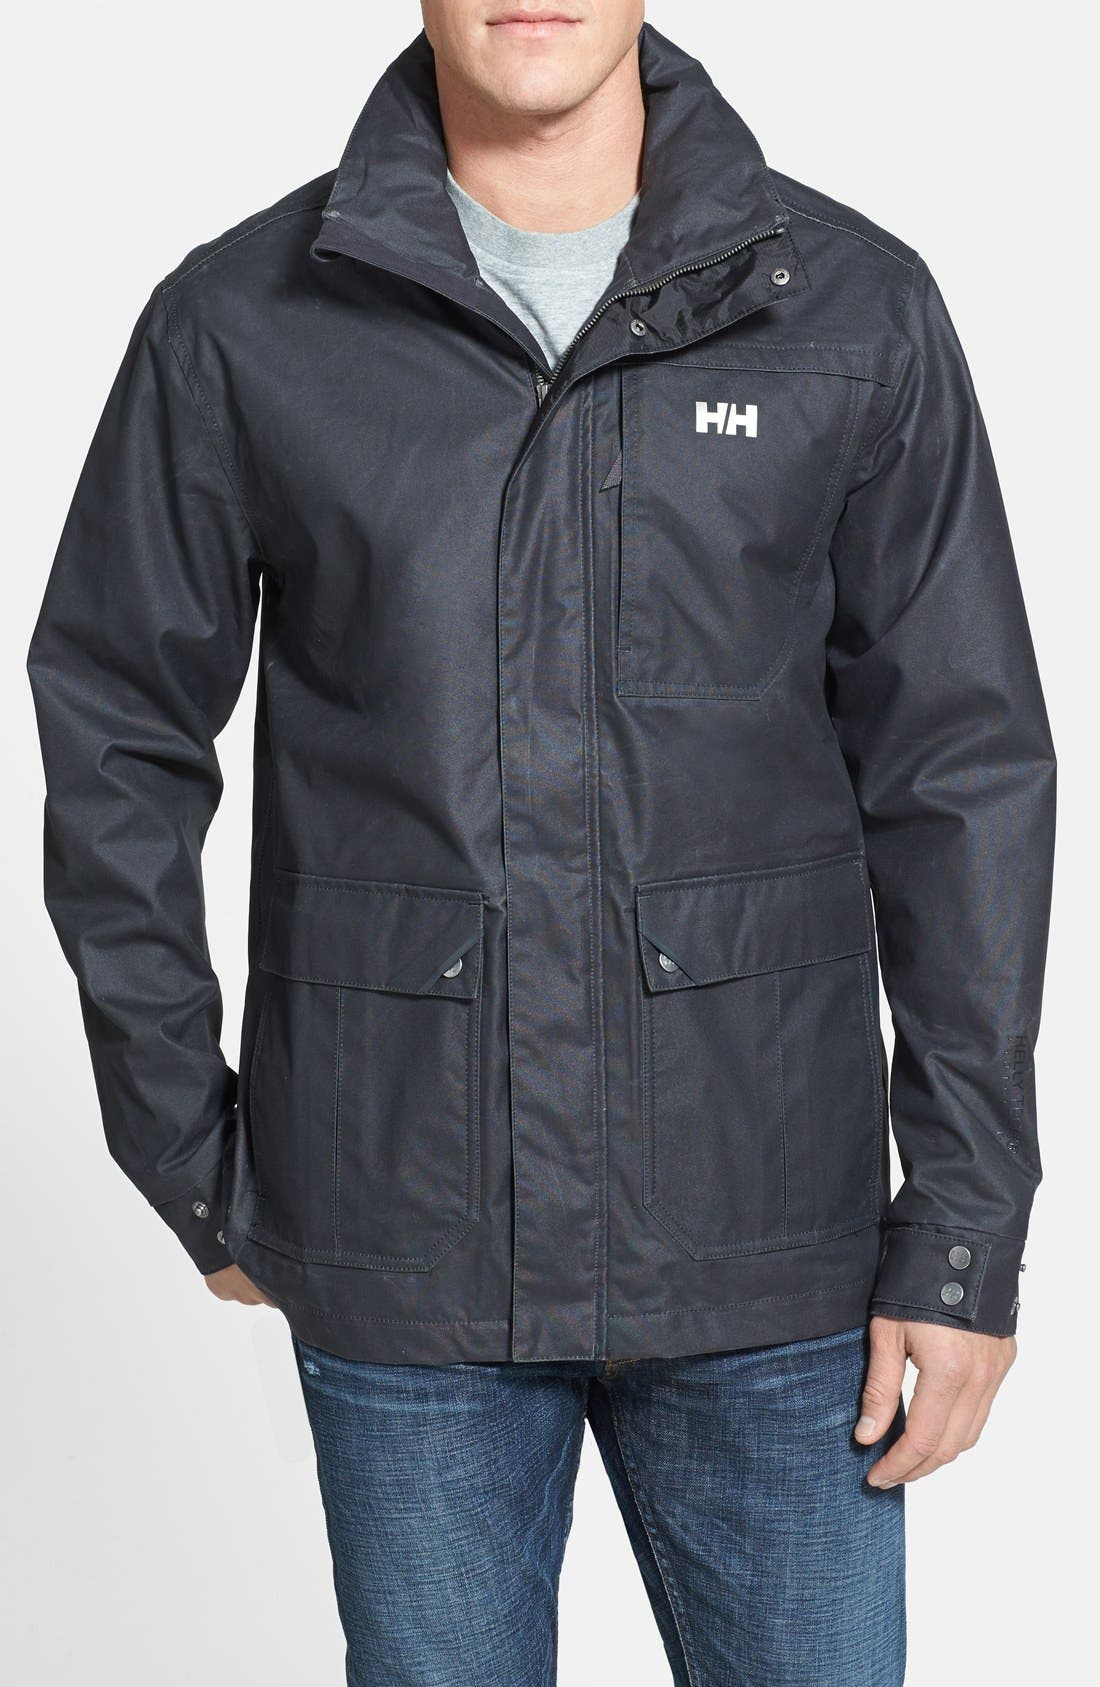 Alternate Image 1 Selected - Helly Hansen 'Robson' Waxed Surface Waterproof & Windproof Jacket